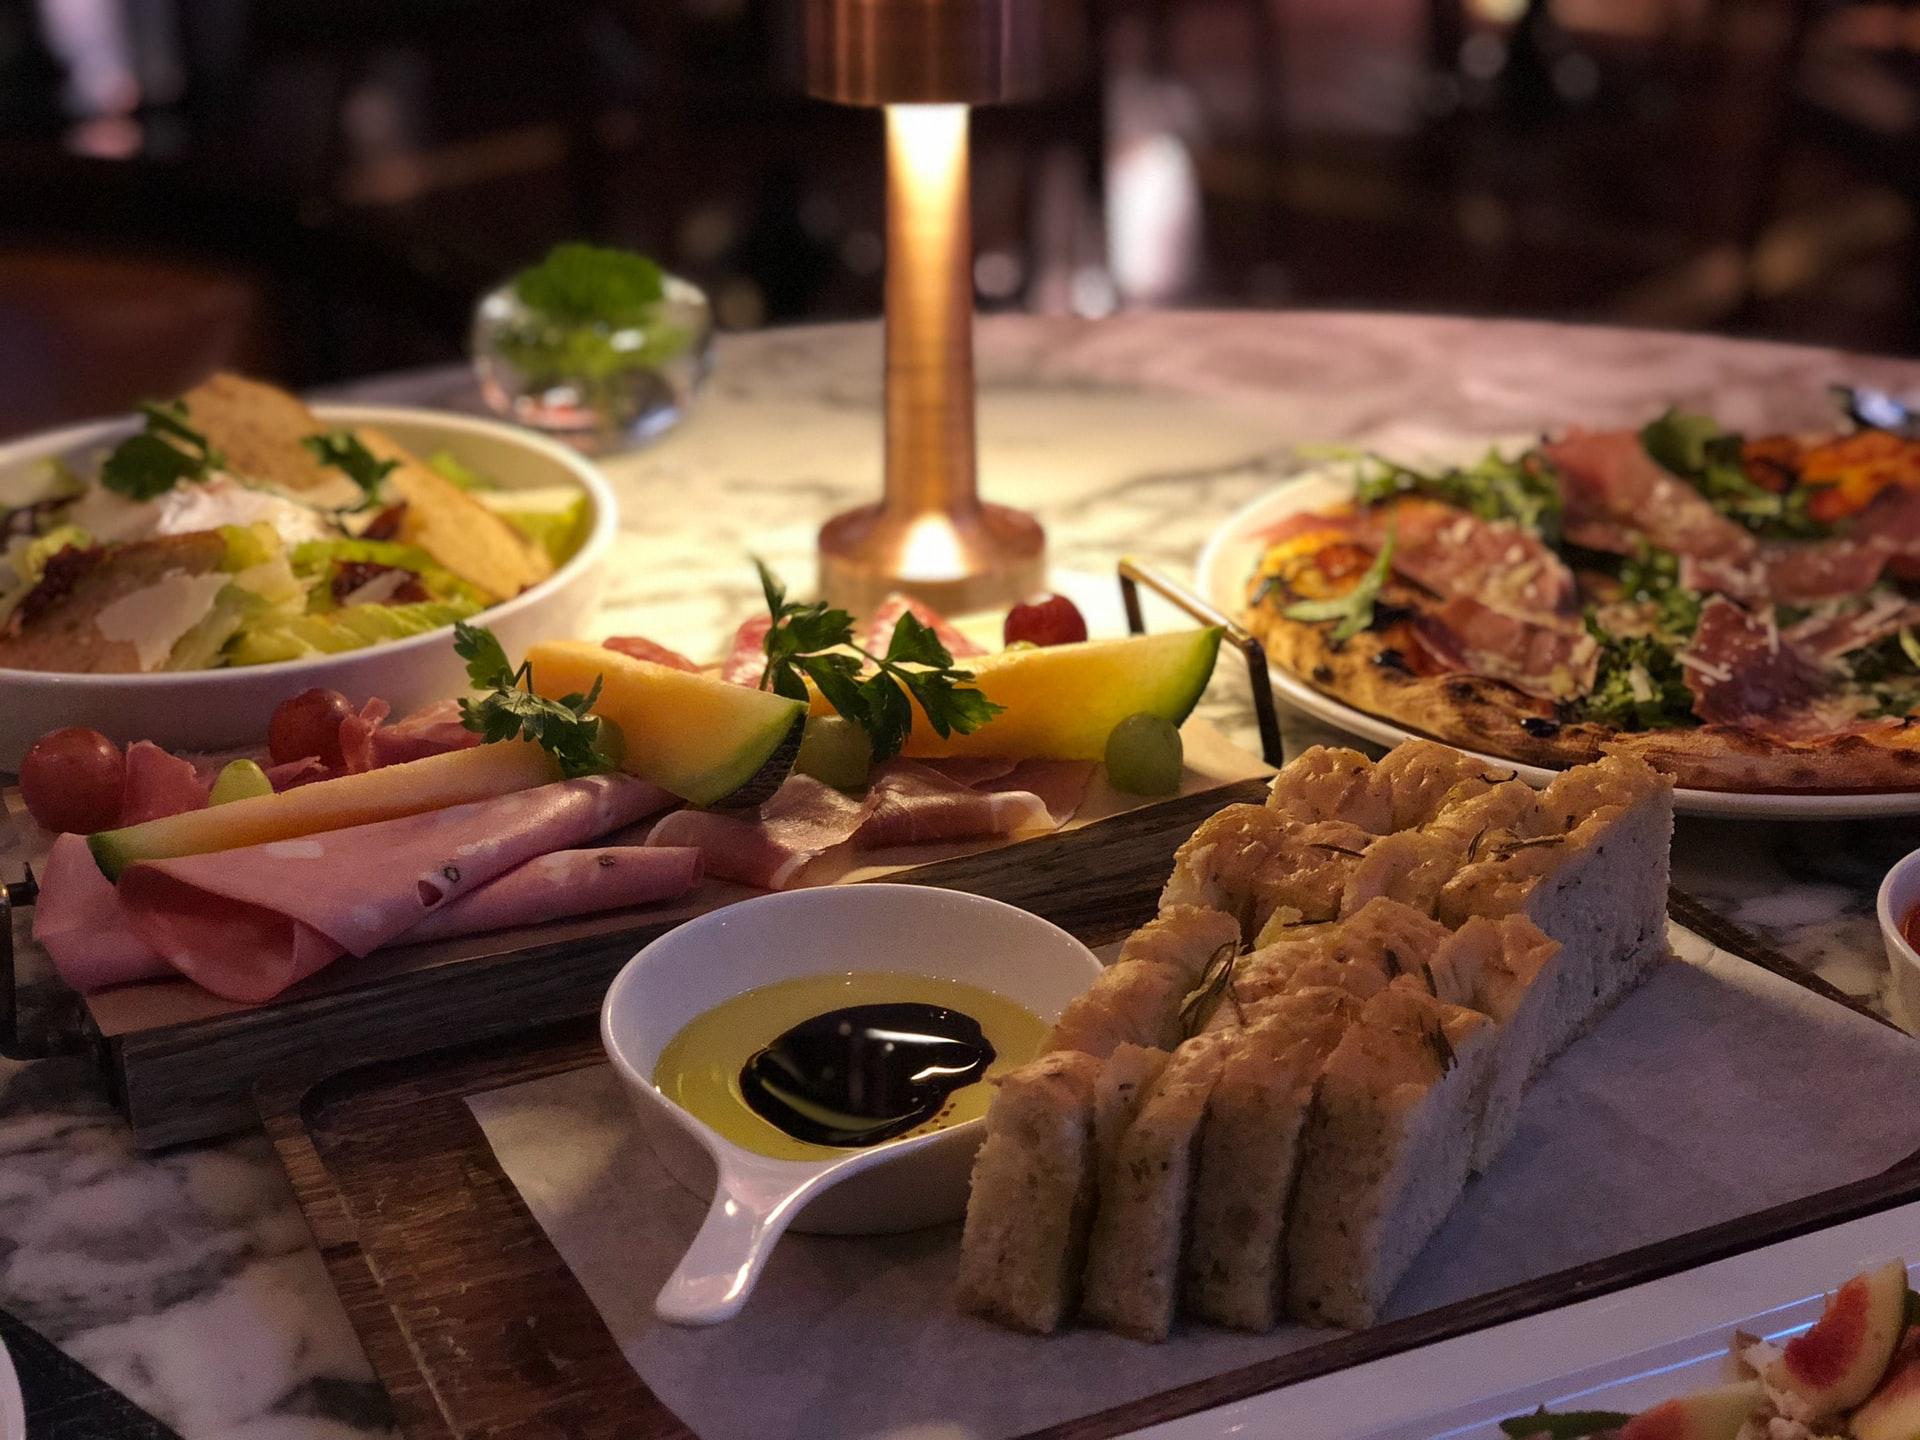 The London Restaurants Now Taking Bookings: West London